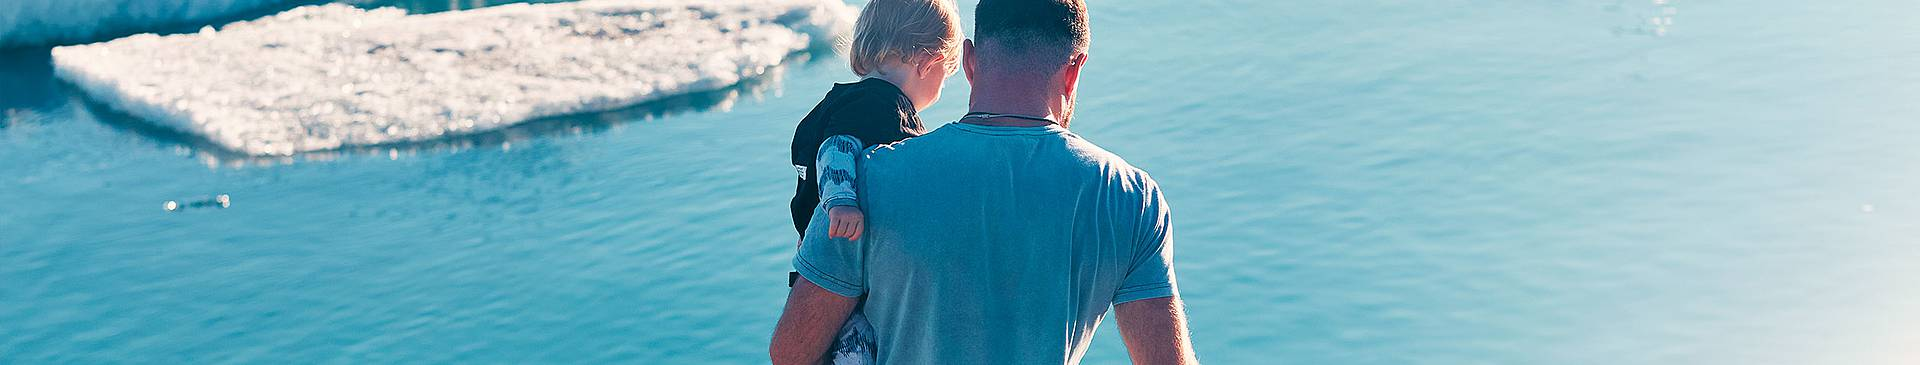 Voyage en Islande en famille